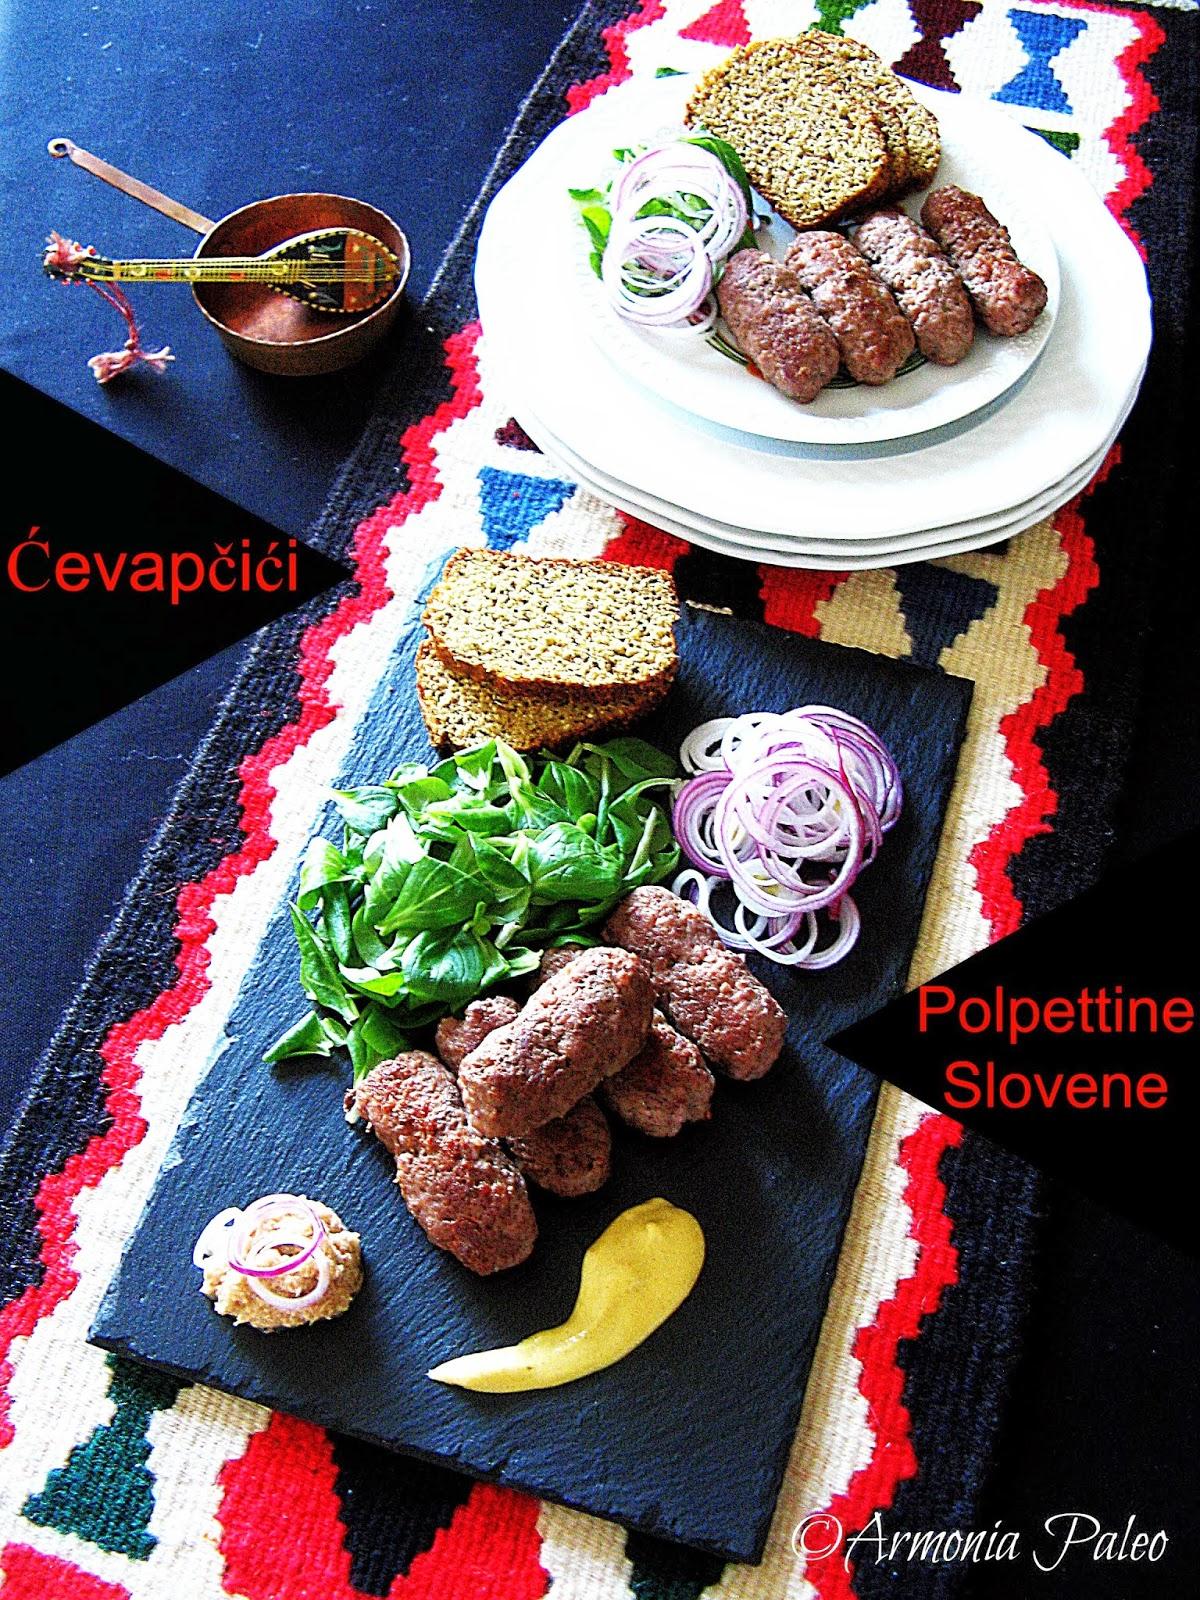 Ćevapčići - Polpettine Slovene di Armonia Paleo